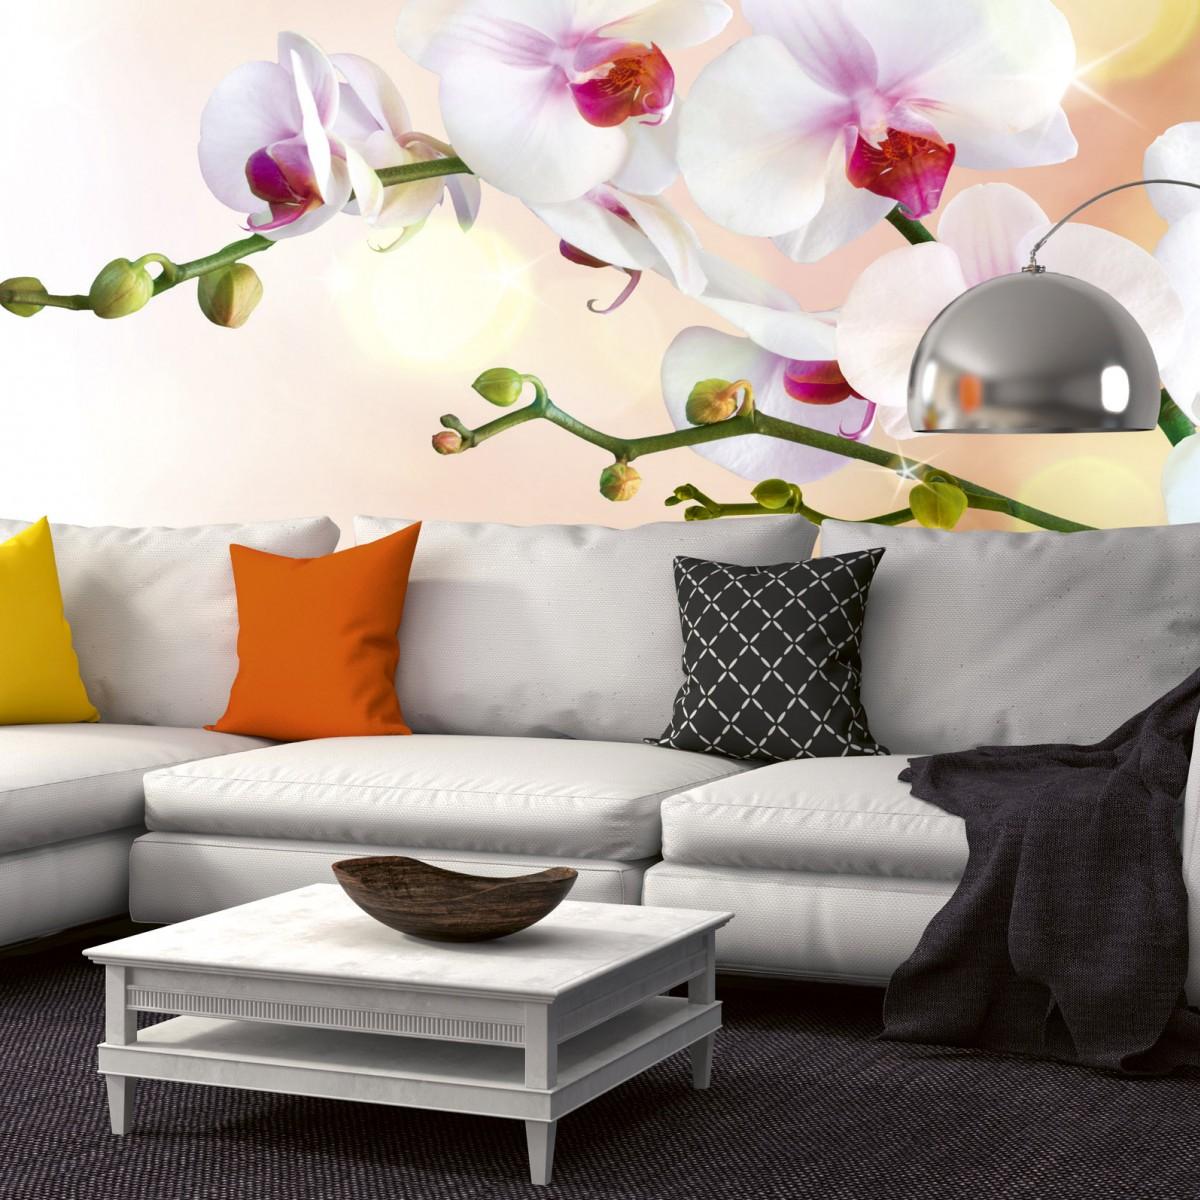 Foto tapet 3D White Orchid, Dimex, 5 fâșii, 375 x 250cm